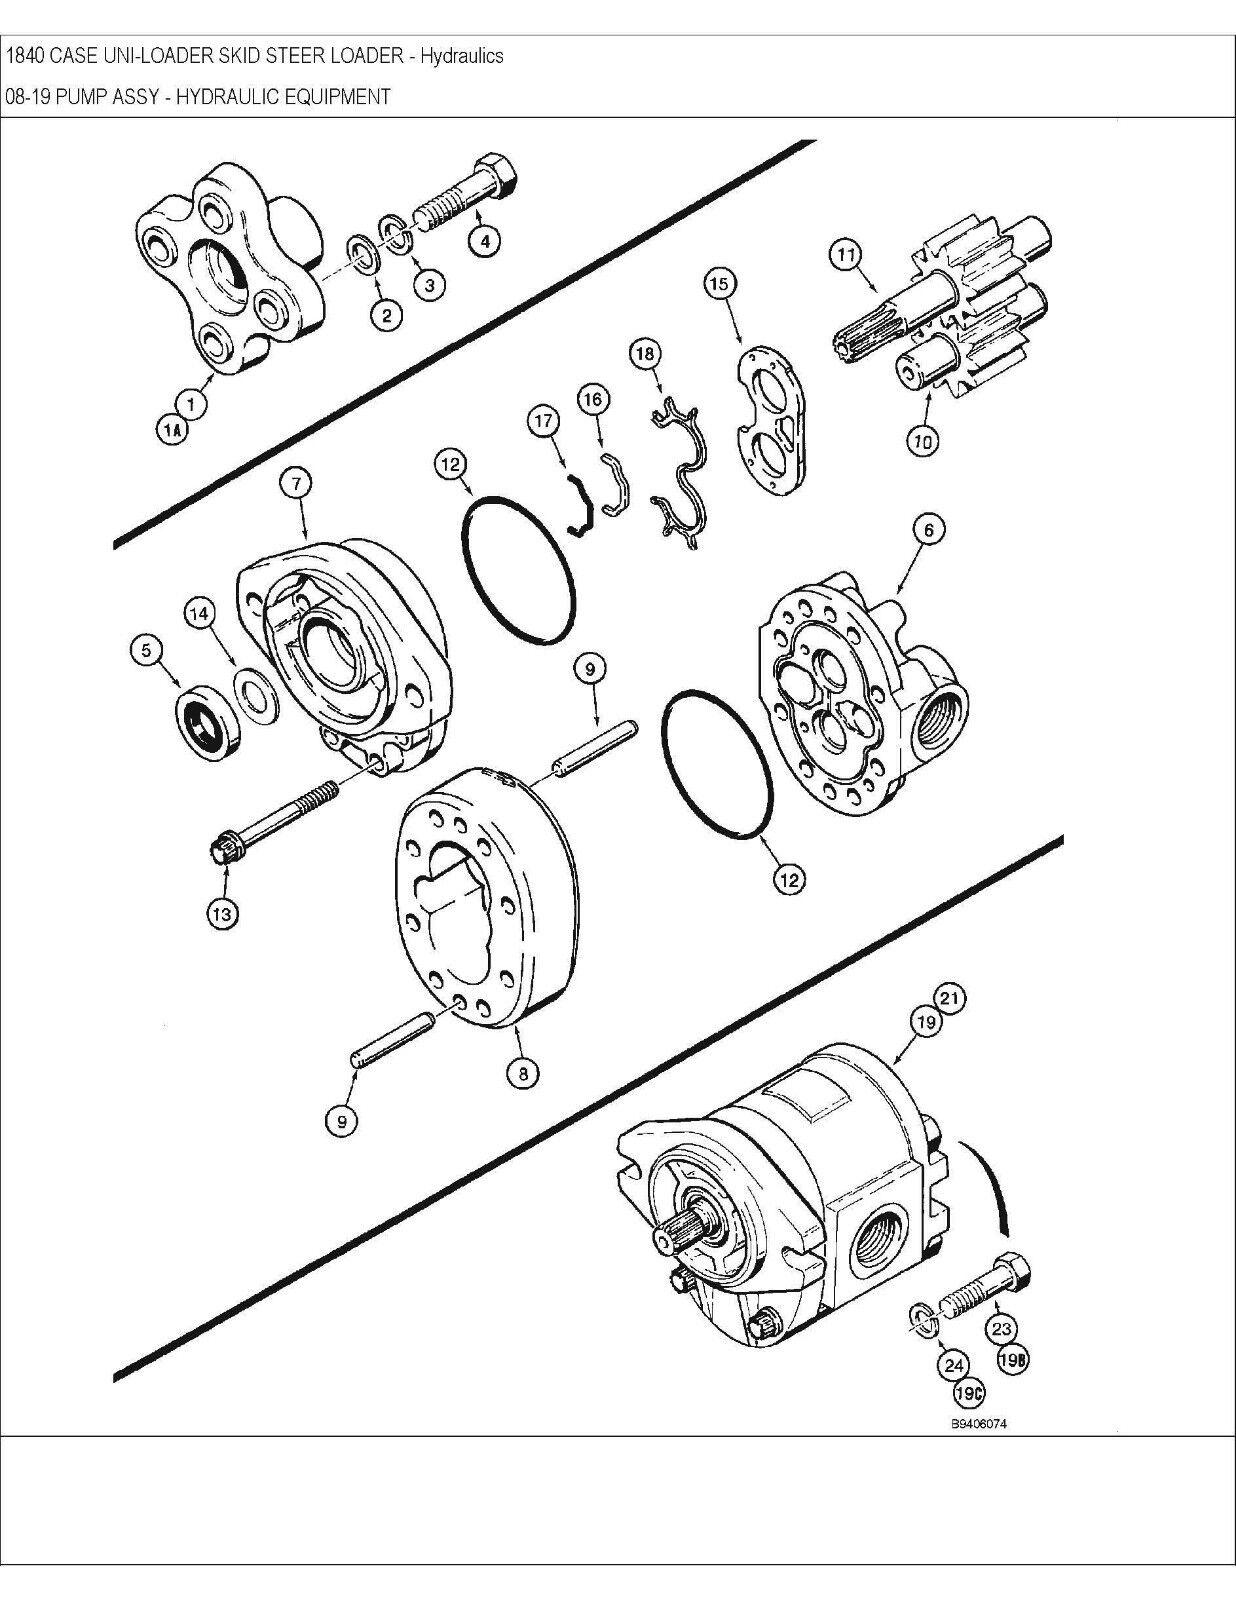 Case 1840 Skid Steer Hydraulic Schematic Library Of Wiring Diagrams 85xt Diagram Loader Service Repair Manual Parts Catalog Rh Picclick Com